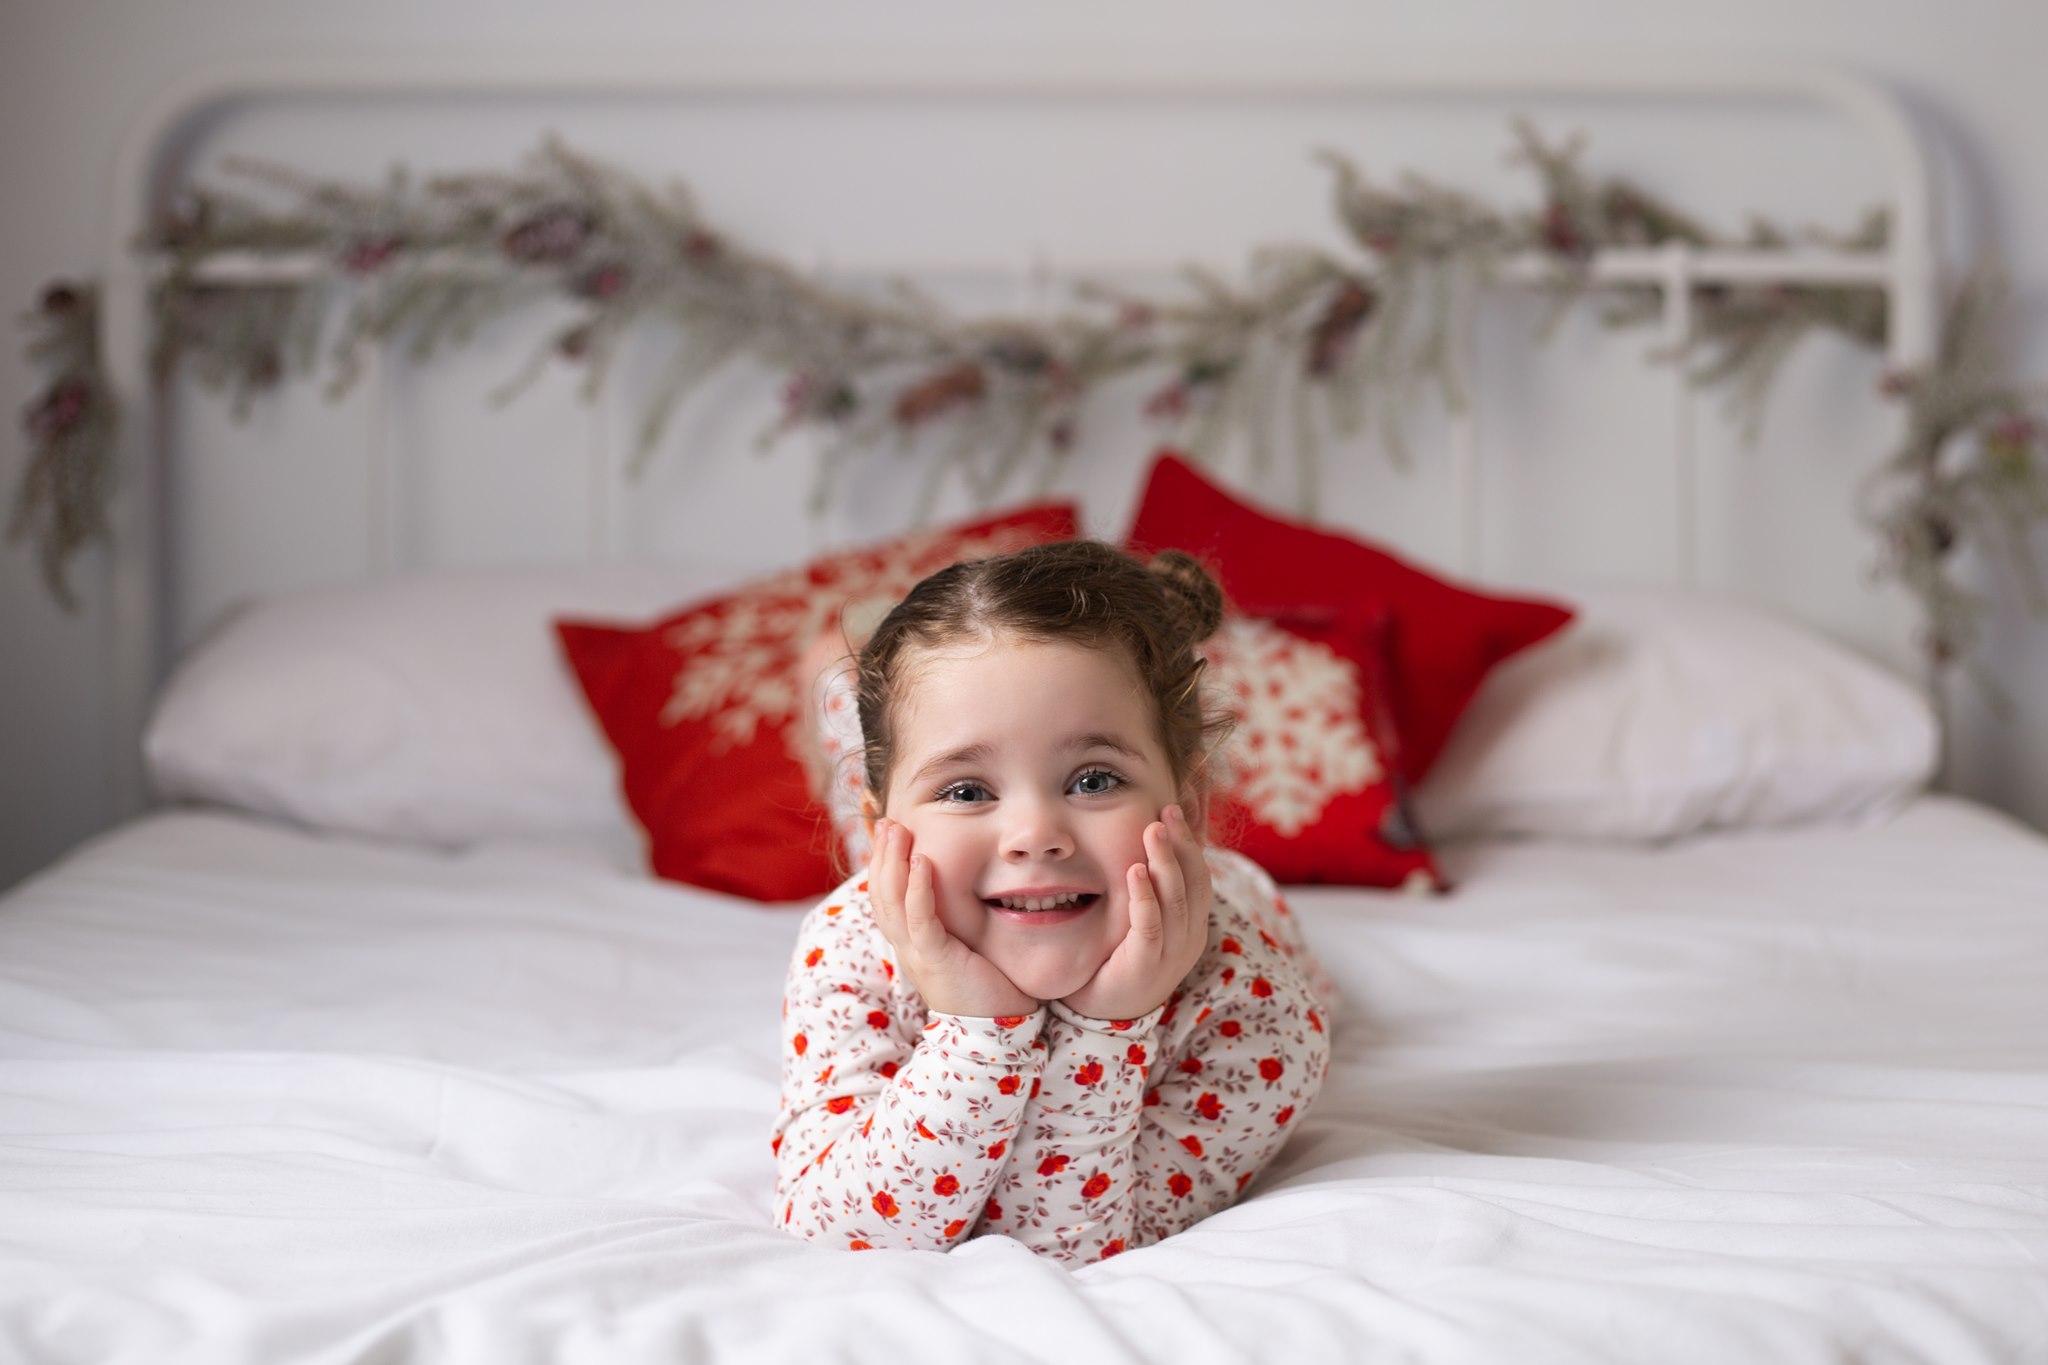 CHRISTMAS-MINI-XMAS-SESSION-CHRISTMAS-PHOTOSHOOT-CHRISTMAS-BED-WHITE-SET-WILLENHALL-WOLVERHAMPTON-WEST-MIDLANDS-3.jpg